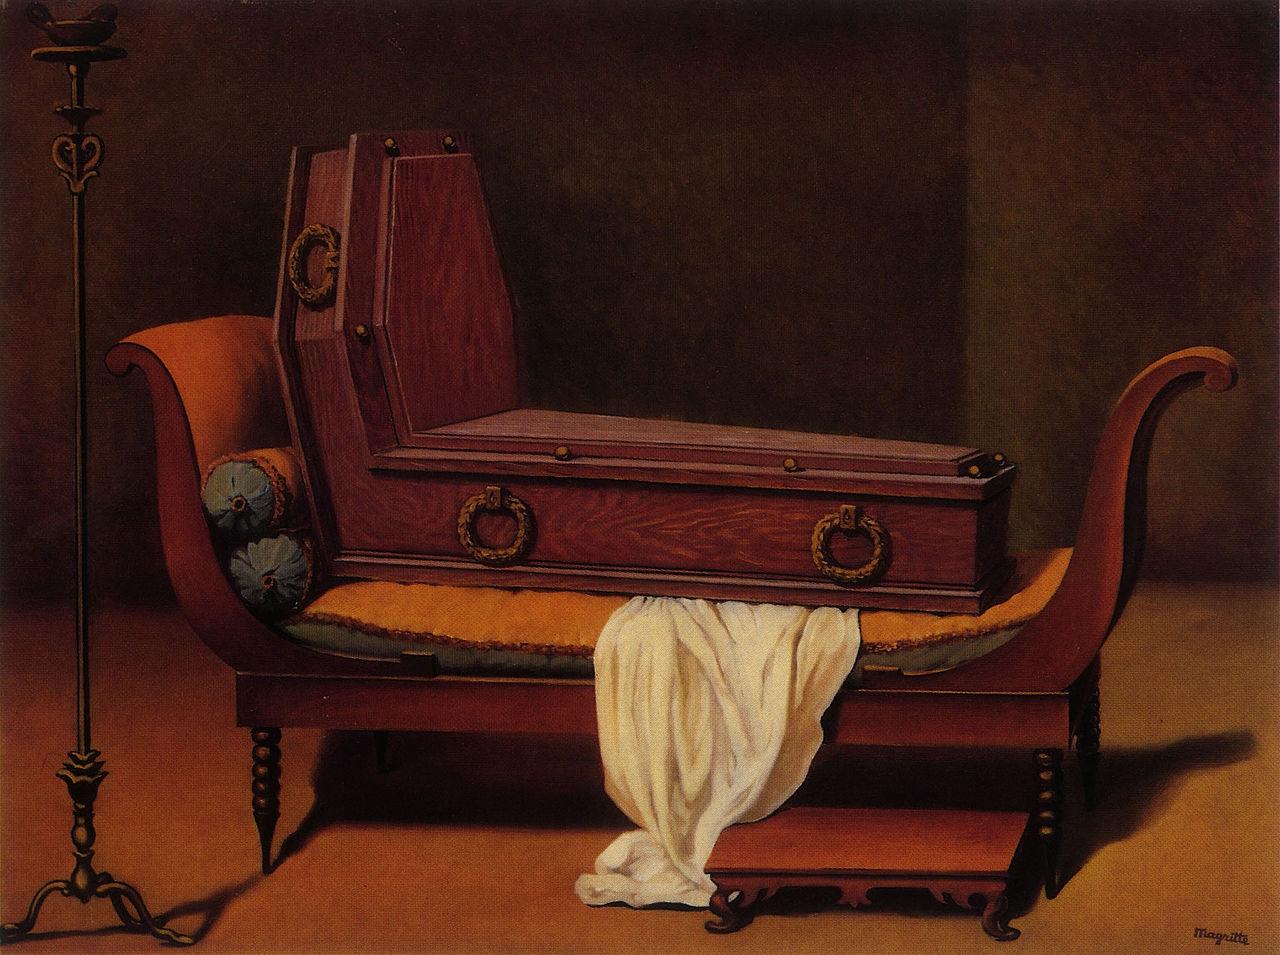 Рене Магритт - Перспектива мадам Рекамье.jpg